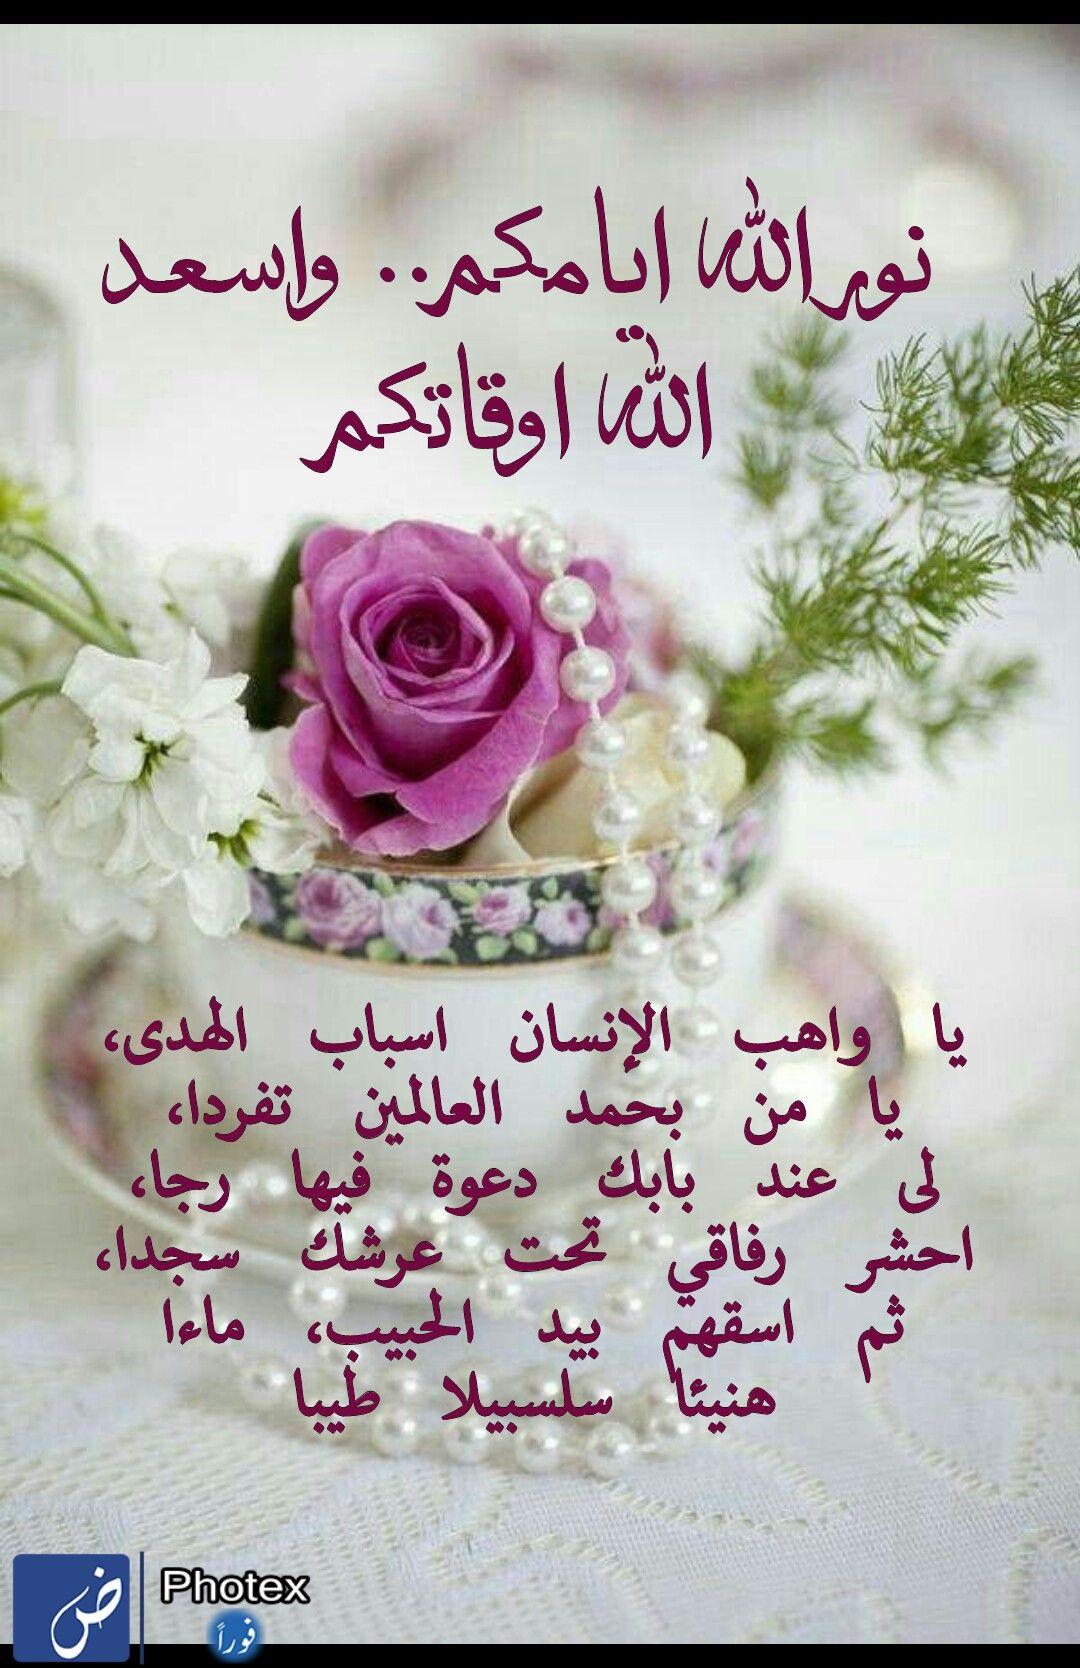 Pin By Hanan Allam On Hanan Arabic Language Islam